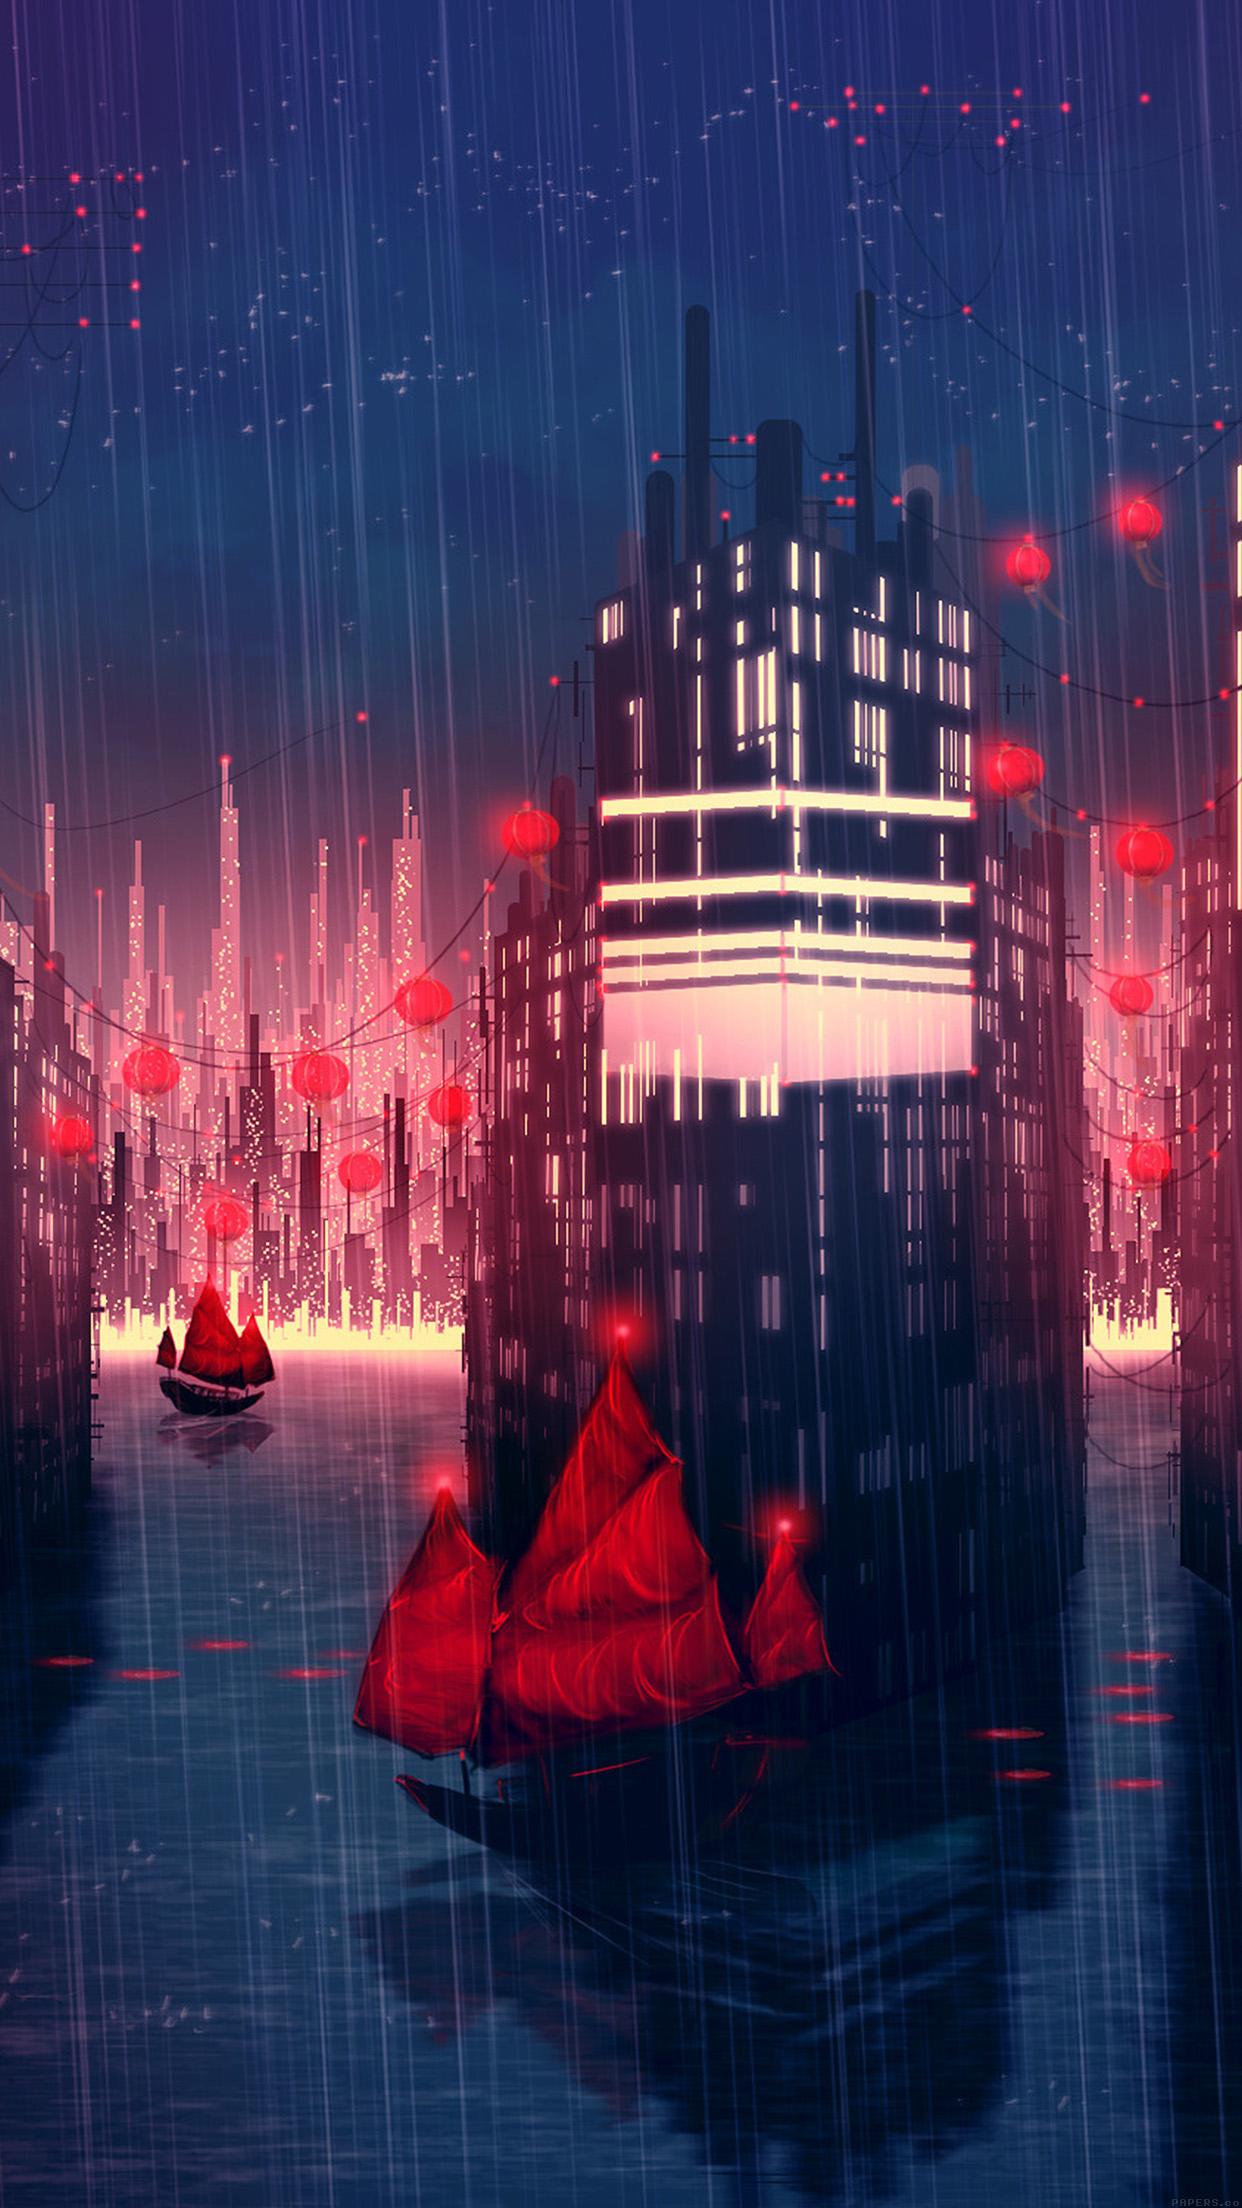 Papers Co Iphone Wallpaper Aj08 Rainy Anime City Art Illust